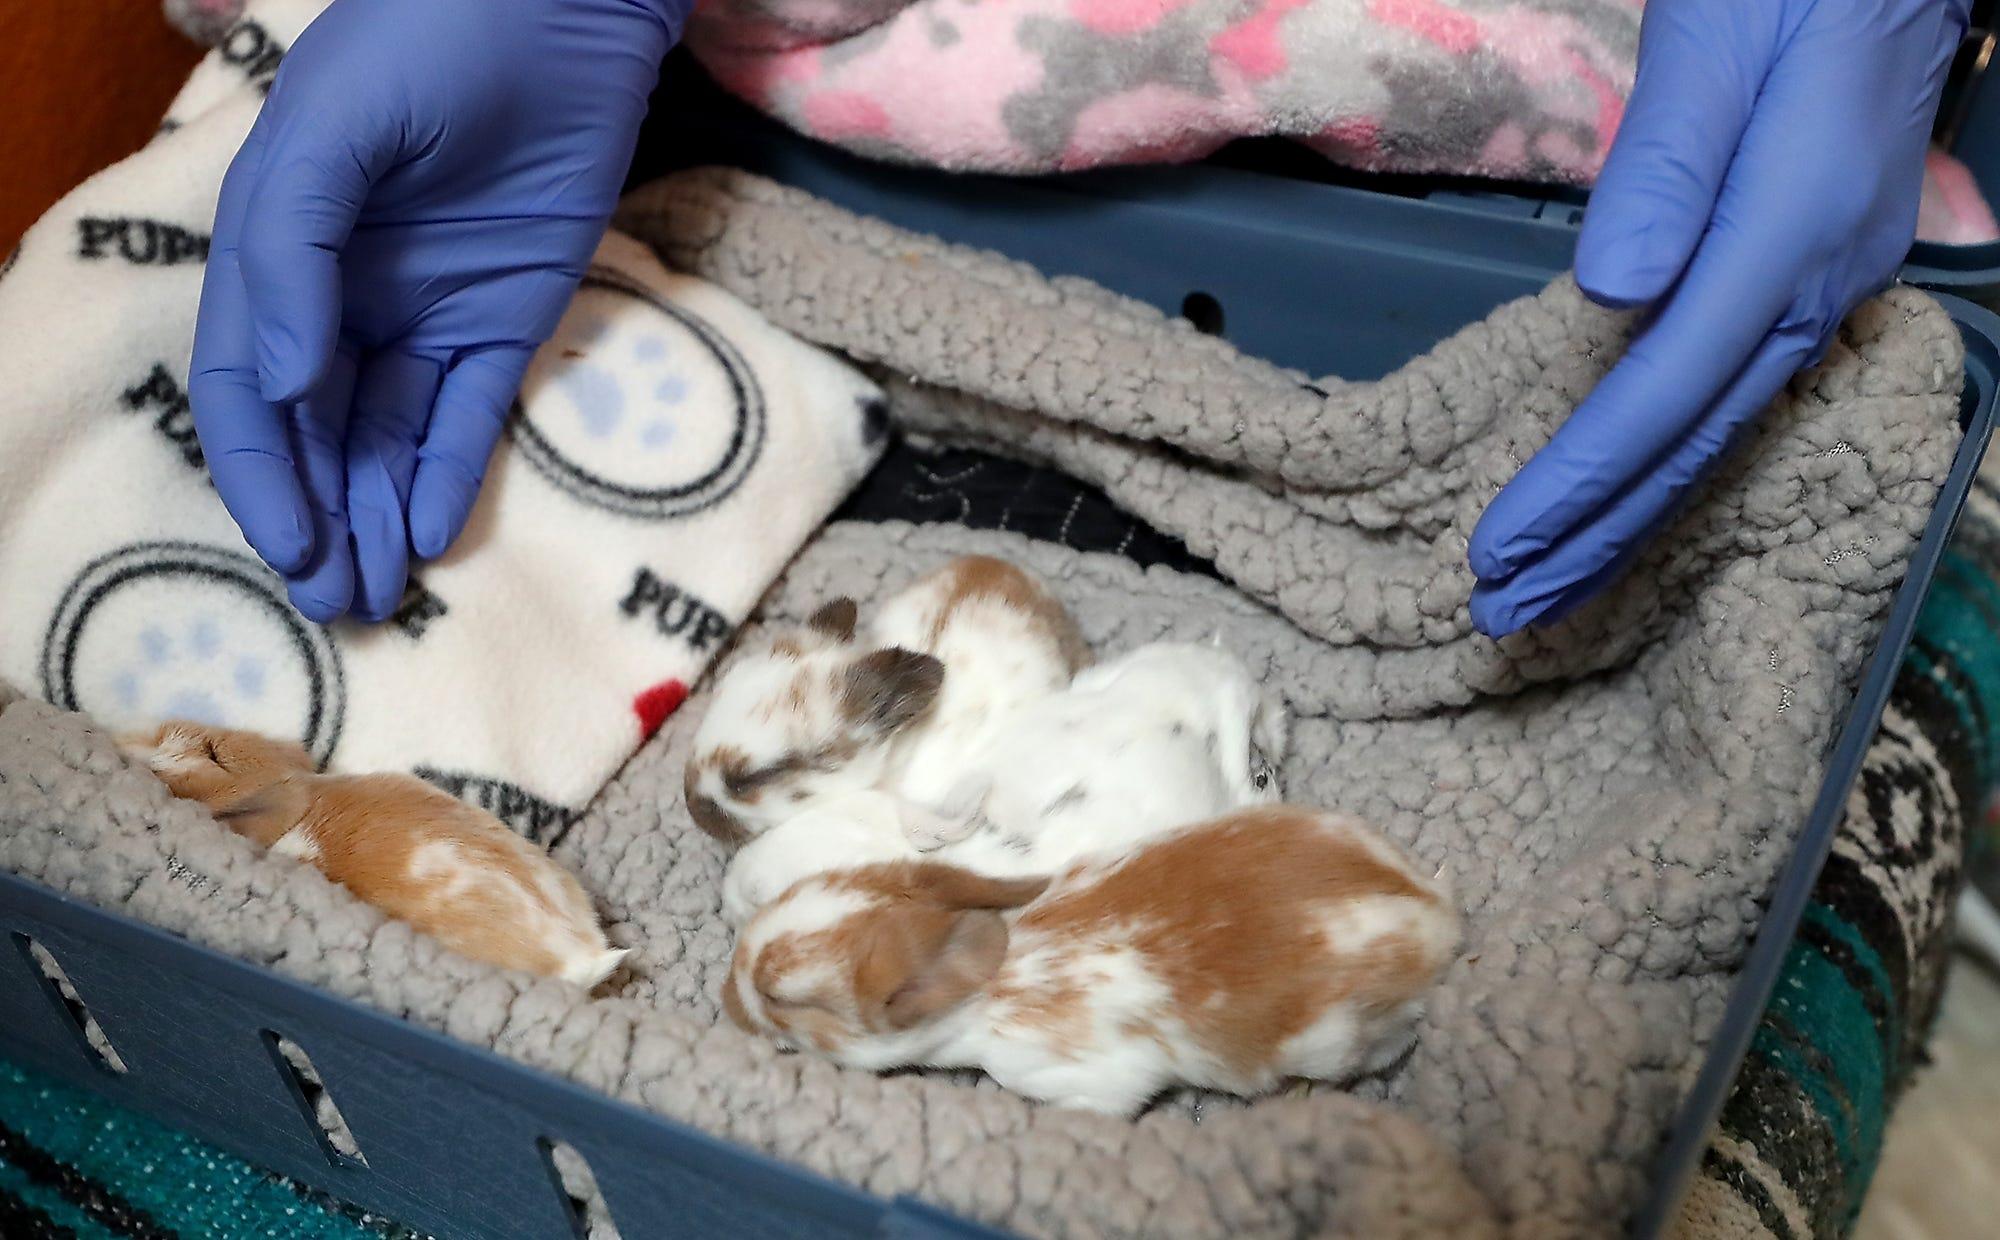 KFC hot tubs, eyeball tattoos, shelter dogs: News from